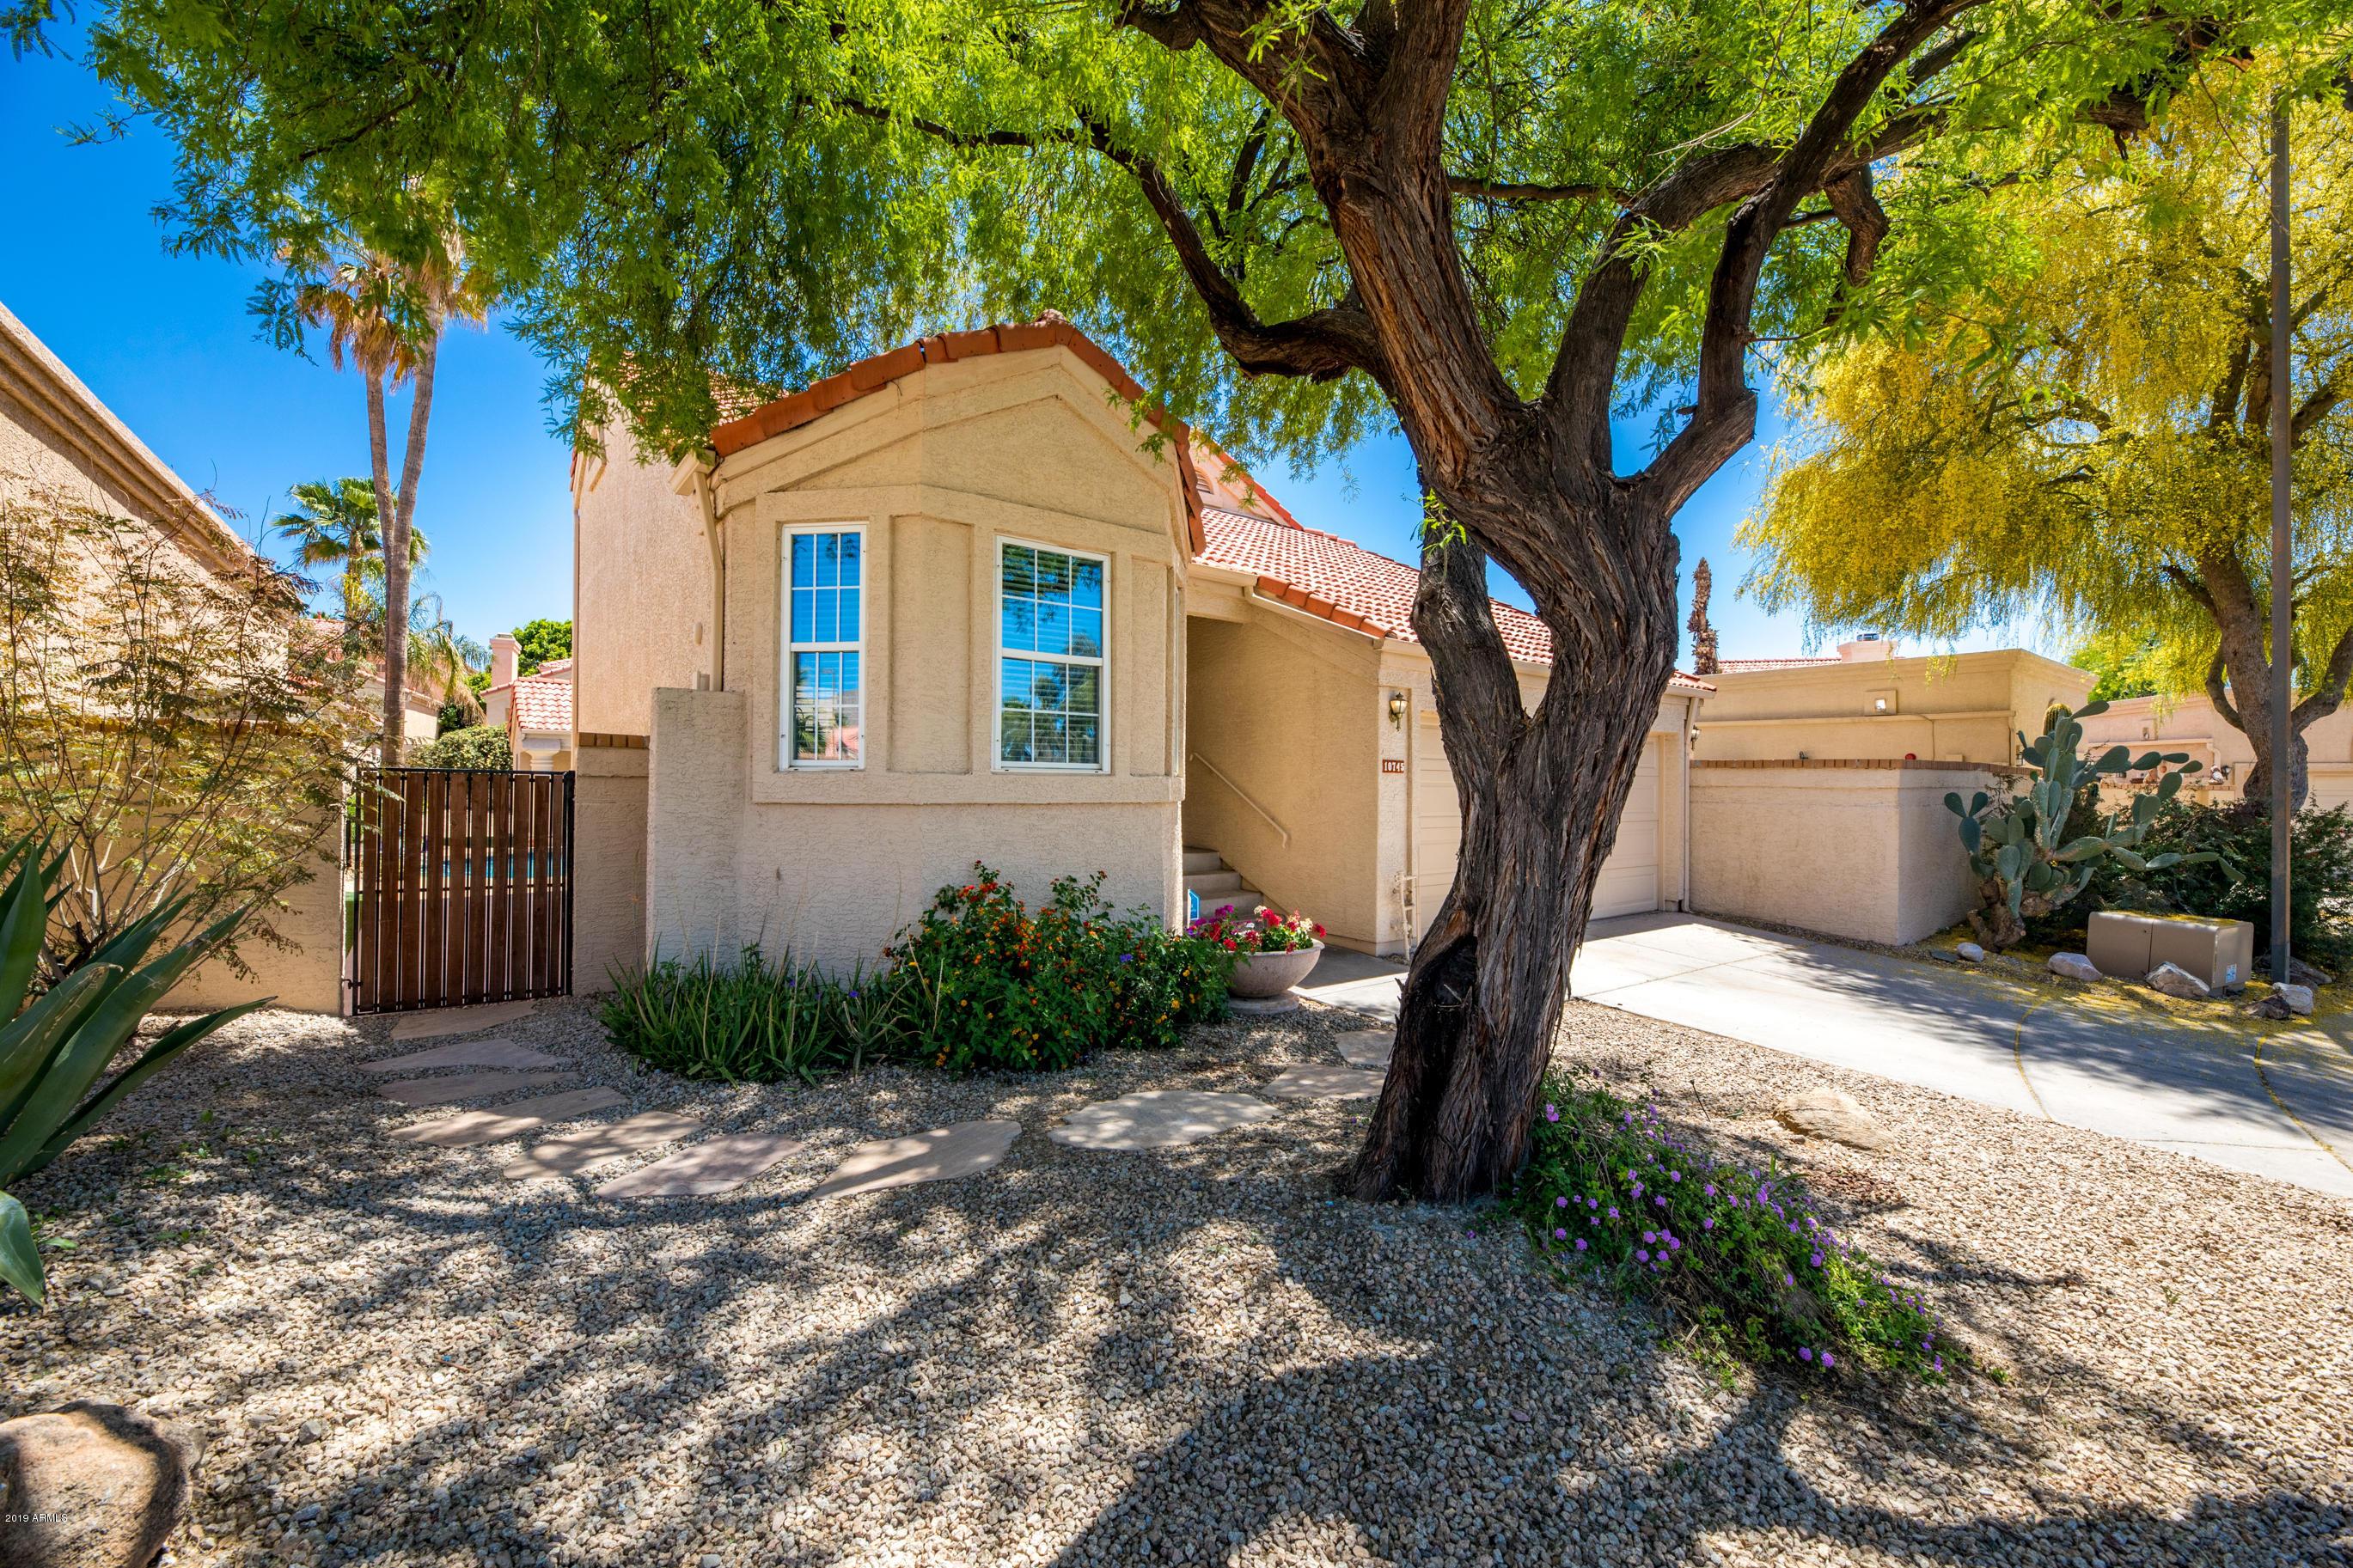 10745 N 112TH Place, Scottsdale, Arizona